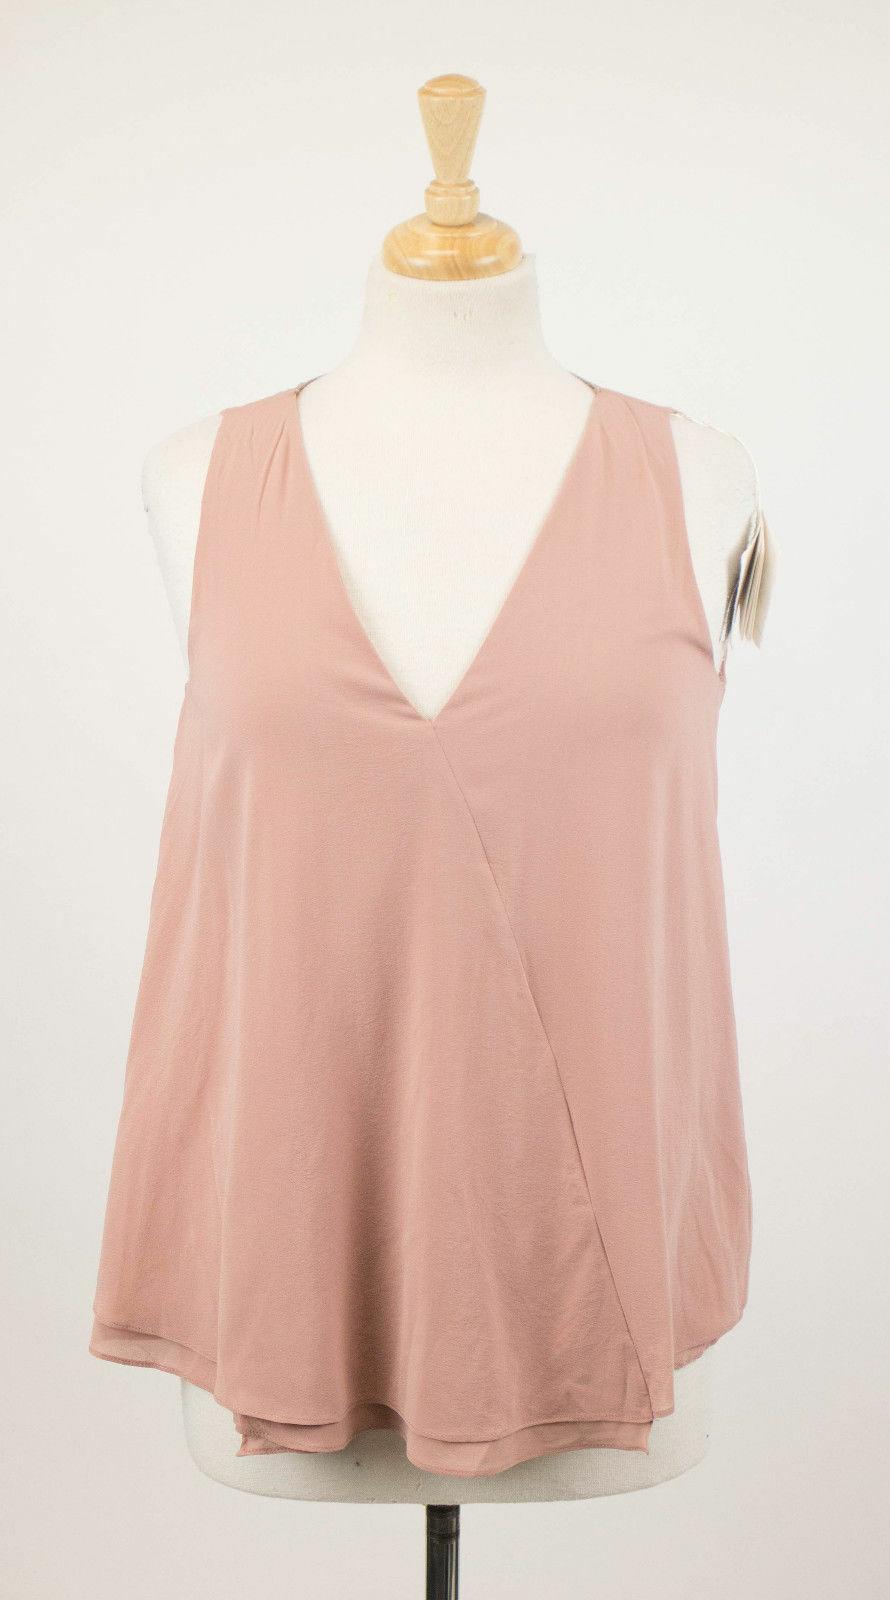 NWT BRUNELLO CUCINELLI Woman's Pink Silk Blend Blouse Shirt Top Size M